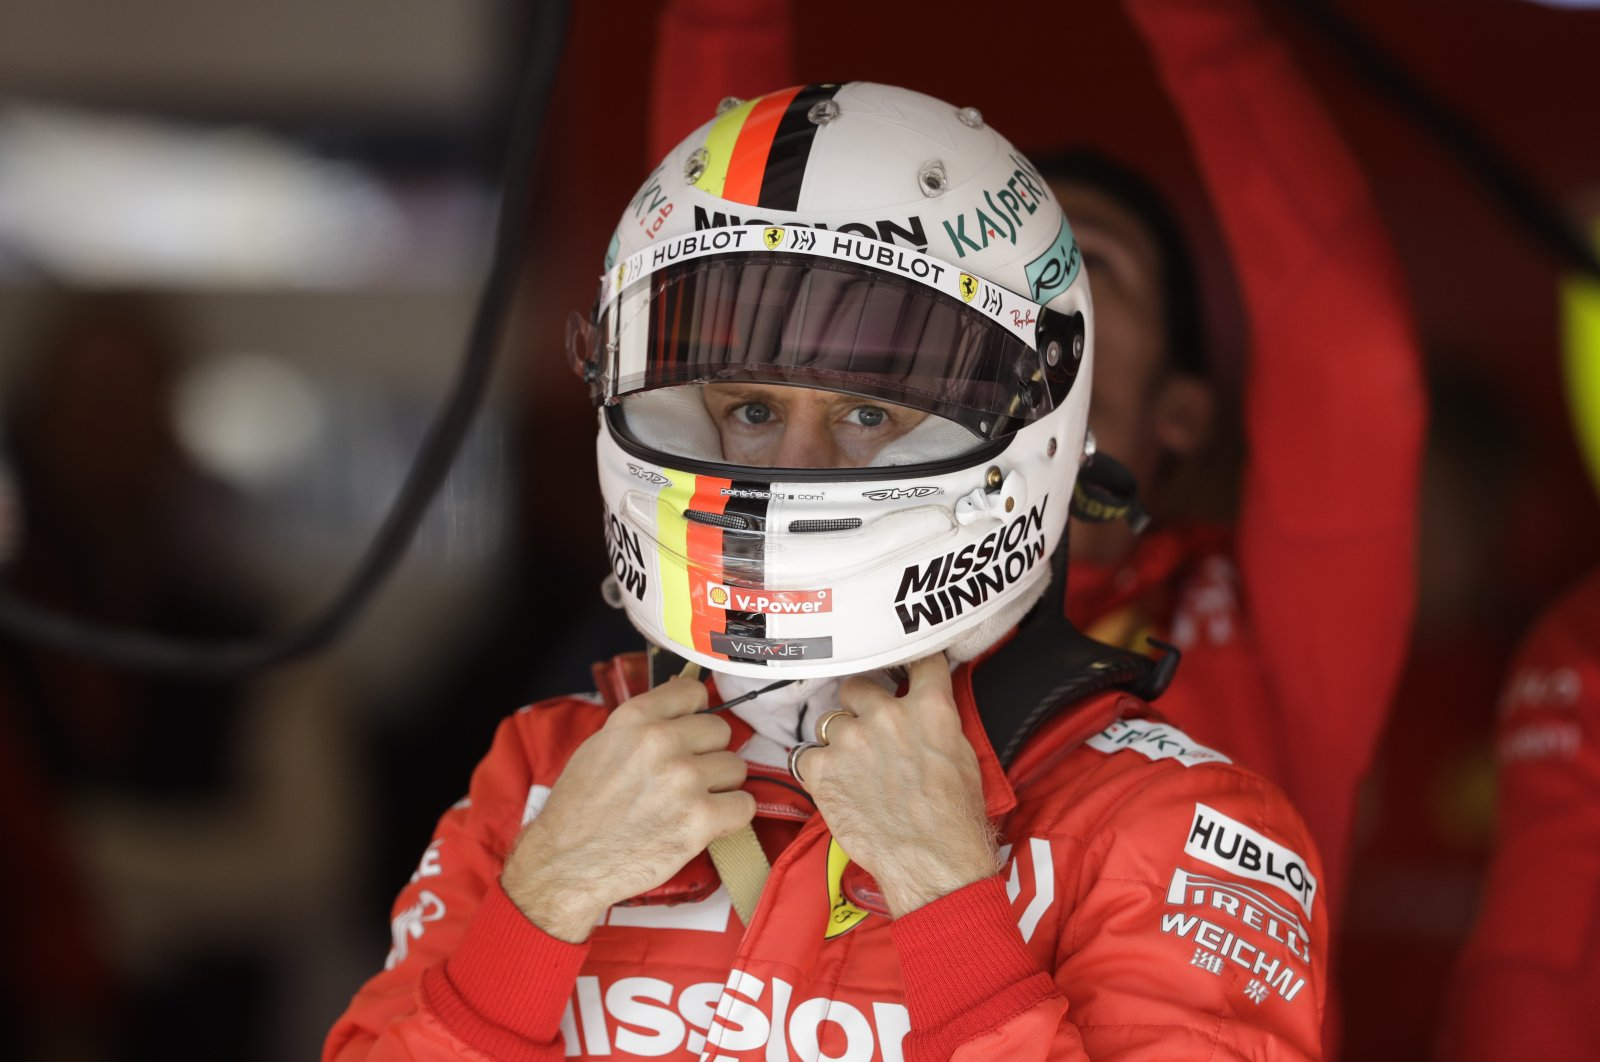 Ferrari driver Sebastian Vettel looks at the results from the second practice session for the F1 U.S. Grand Prix auto race in Austin, Texas, U.S., Nov. 1, 2019. (AP Photo)